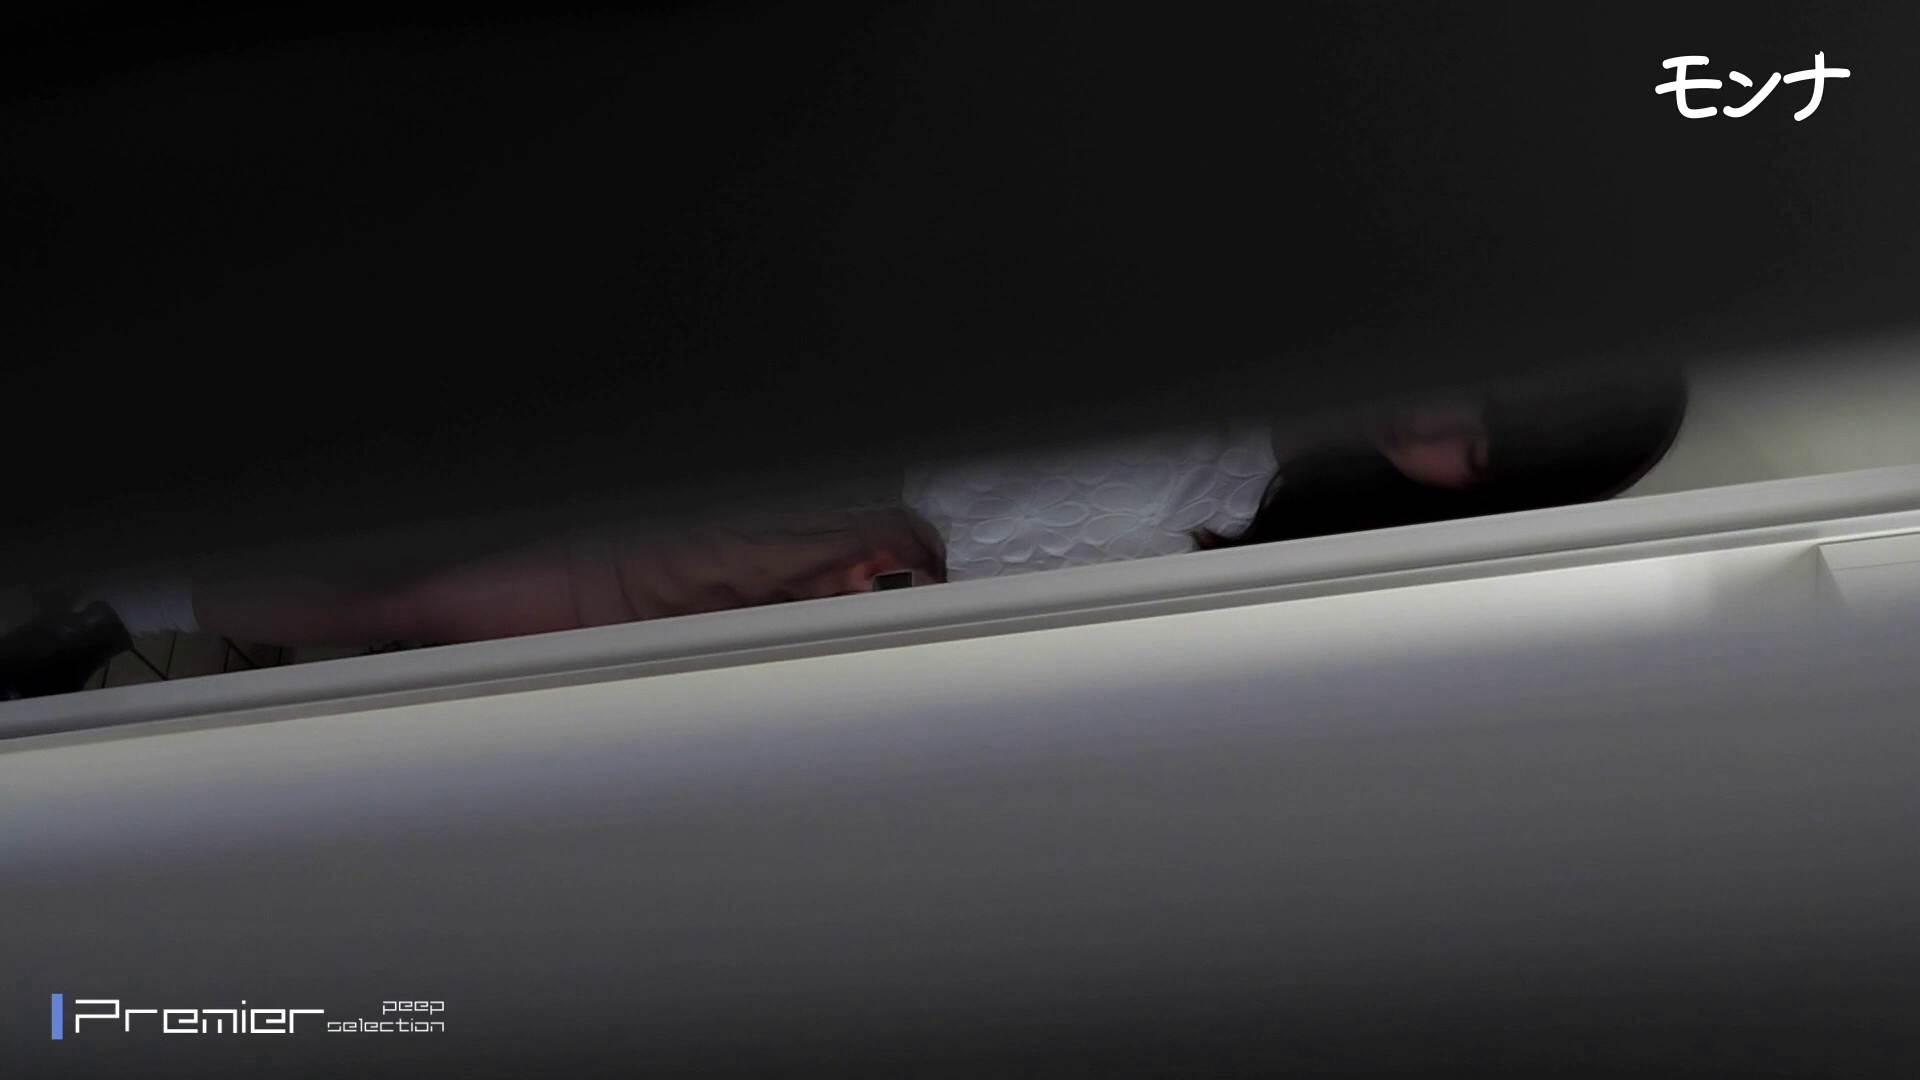 CM 清楚なお女市さんから流れる綺麗な聖水【美しい日本の未来 No.125】 丸見え すけべAV動画紹介 107枚 82